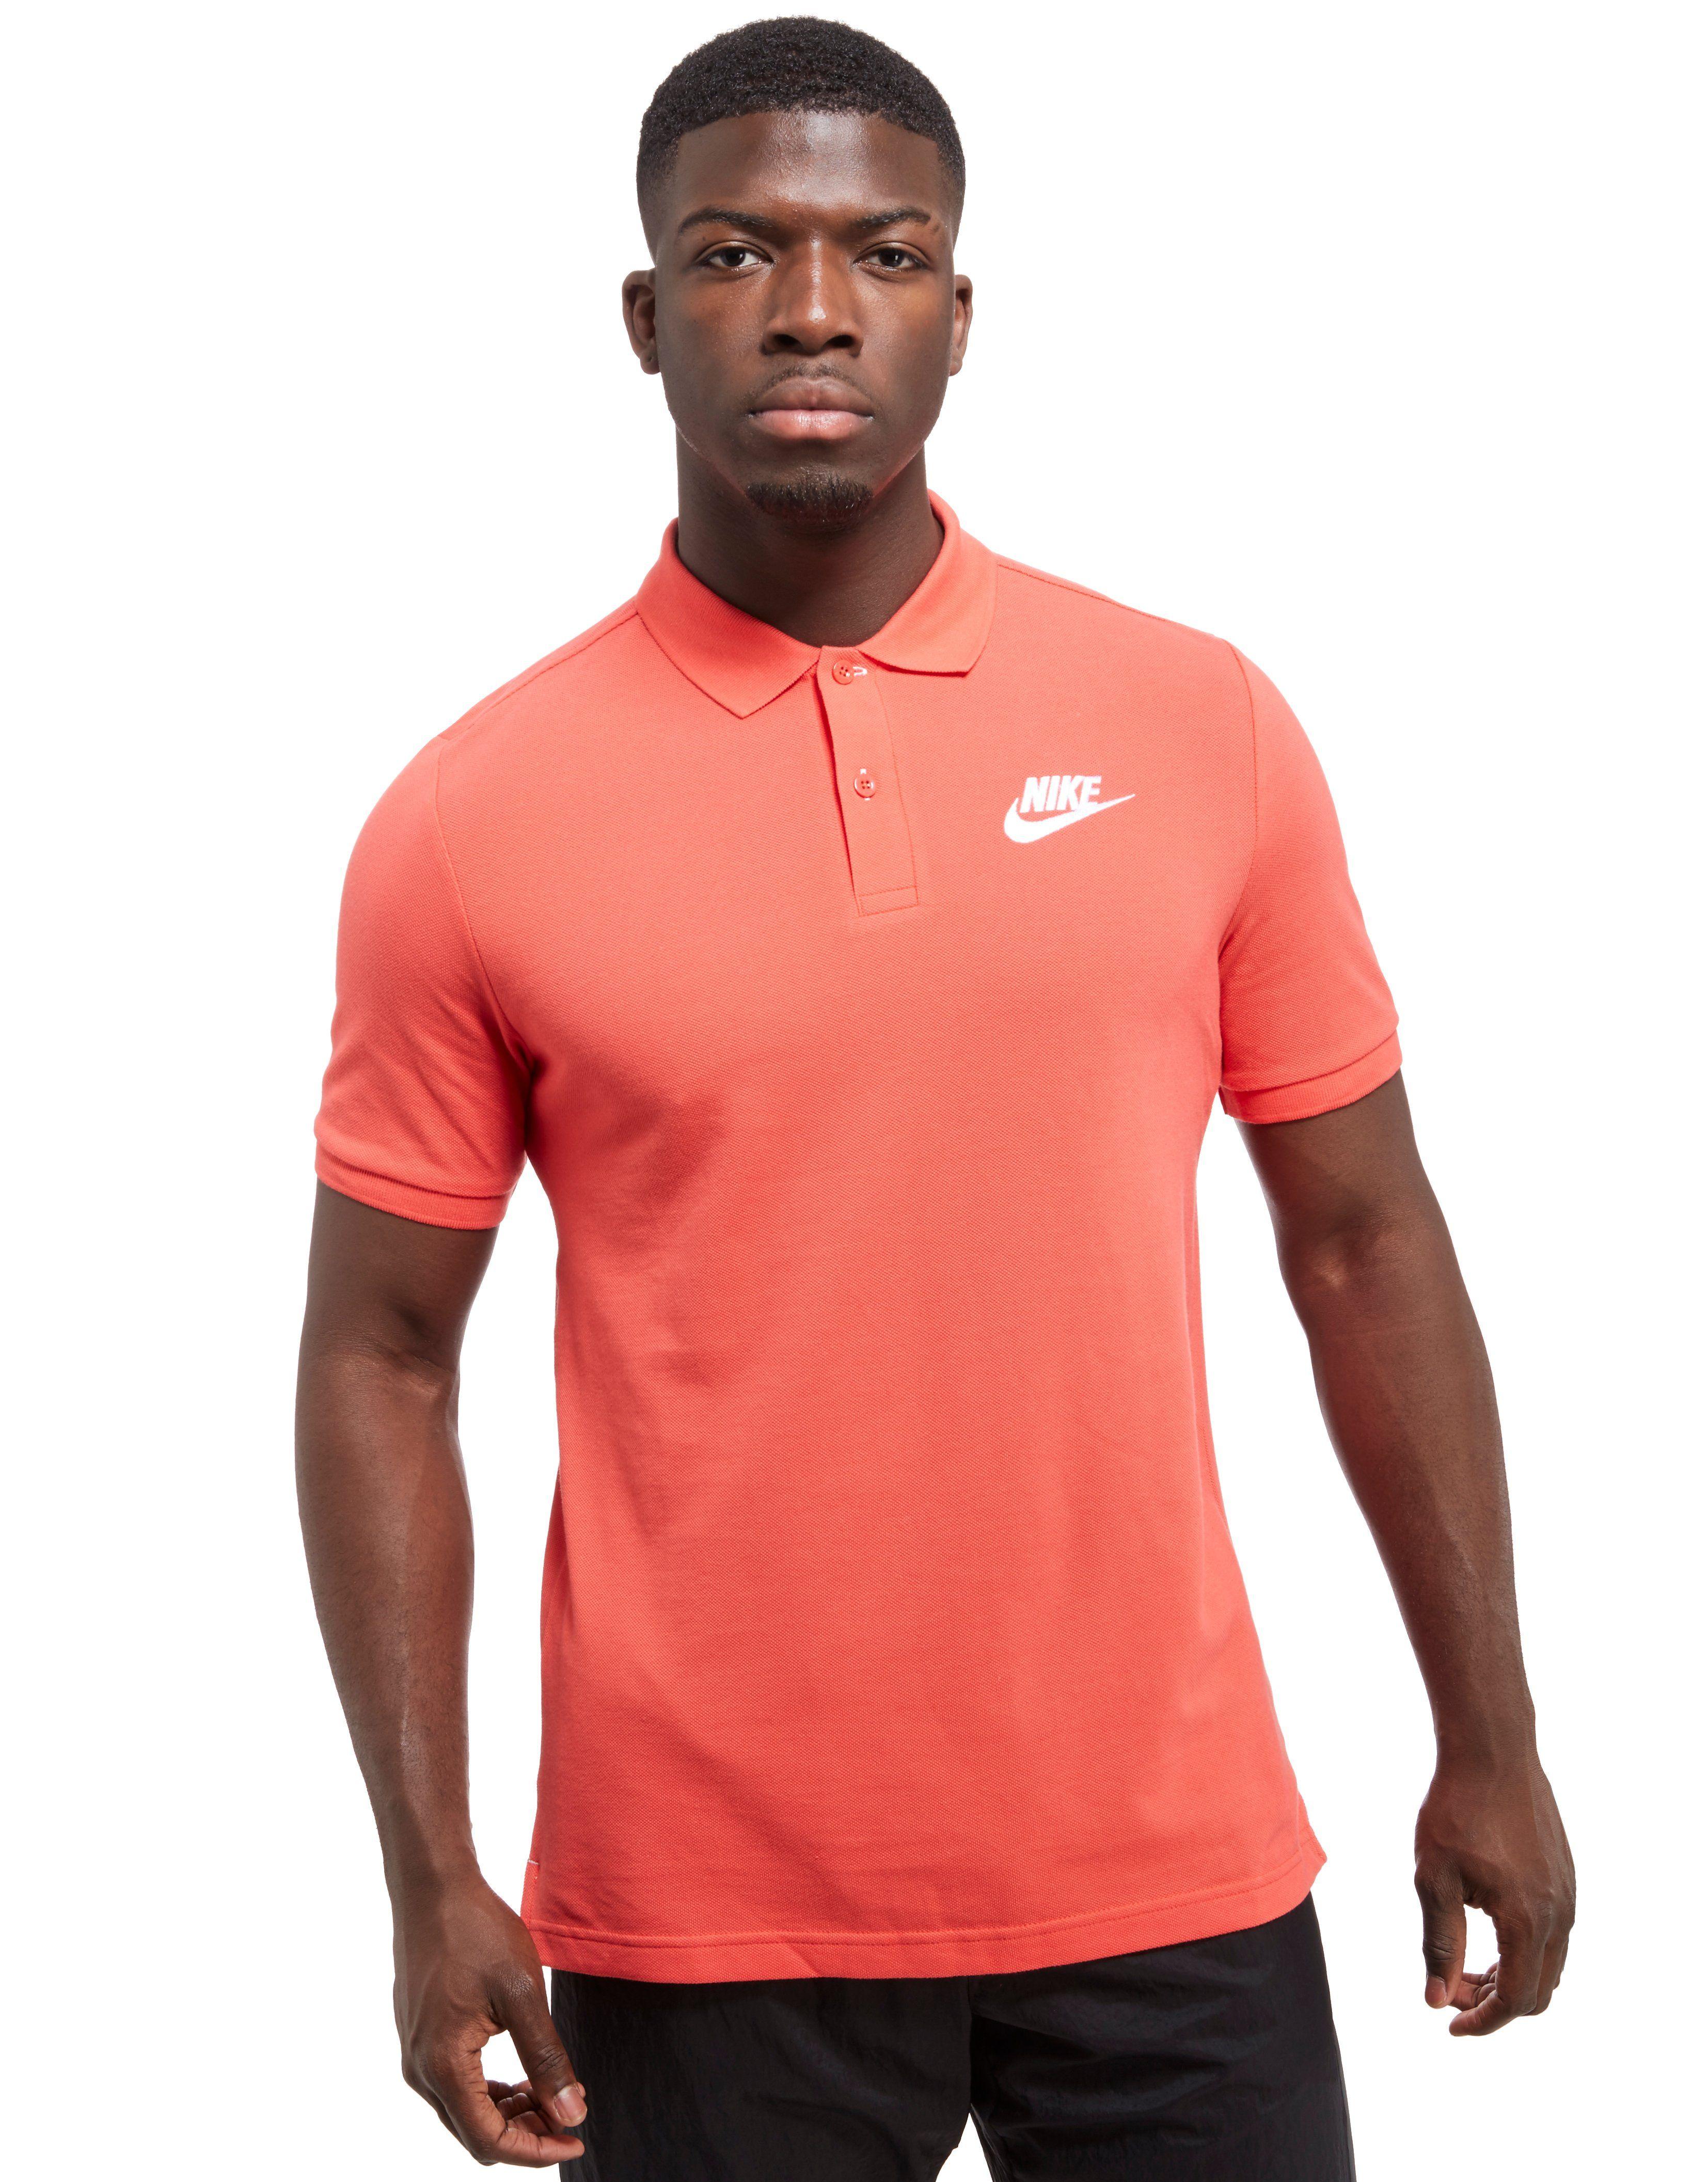 durable service Nike Club Pique Polo Shirt JD Sports ... 7e8e46b973e4